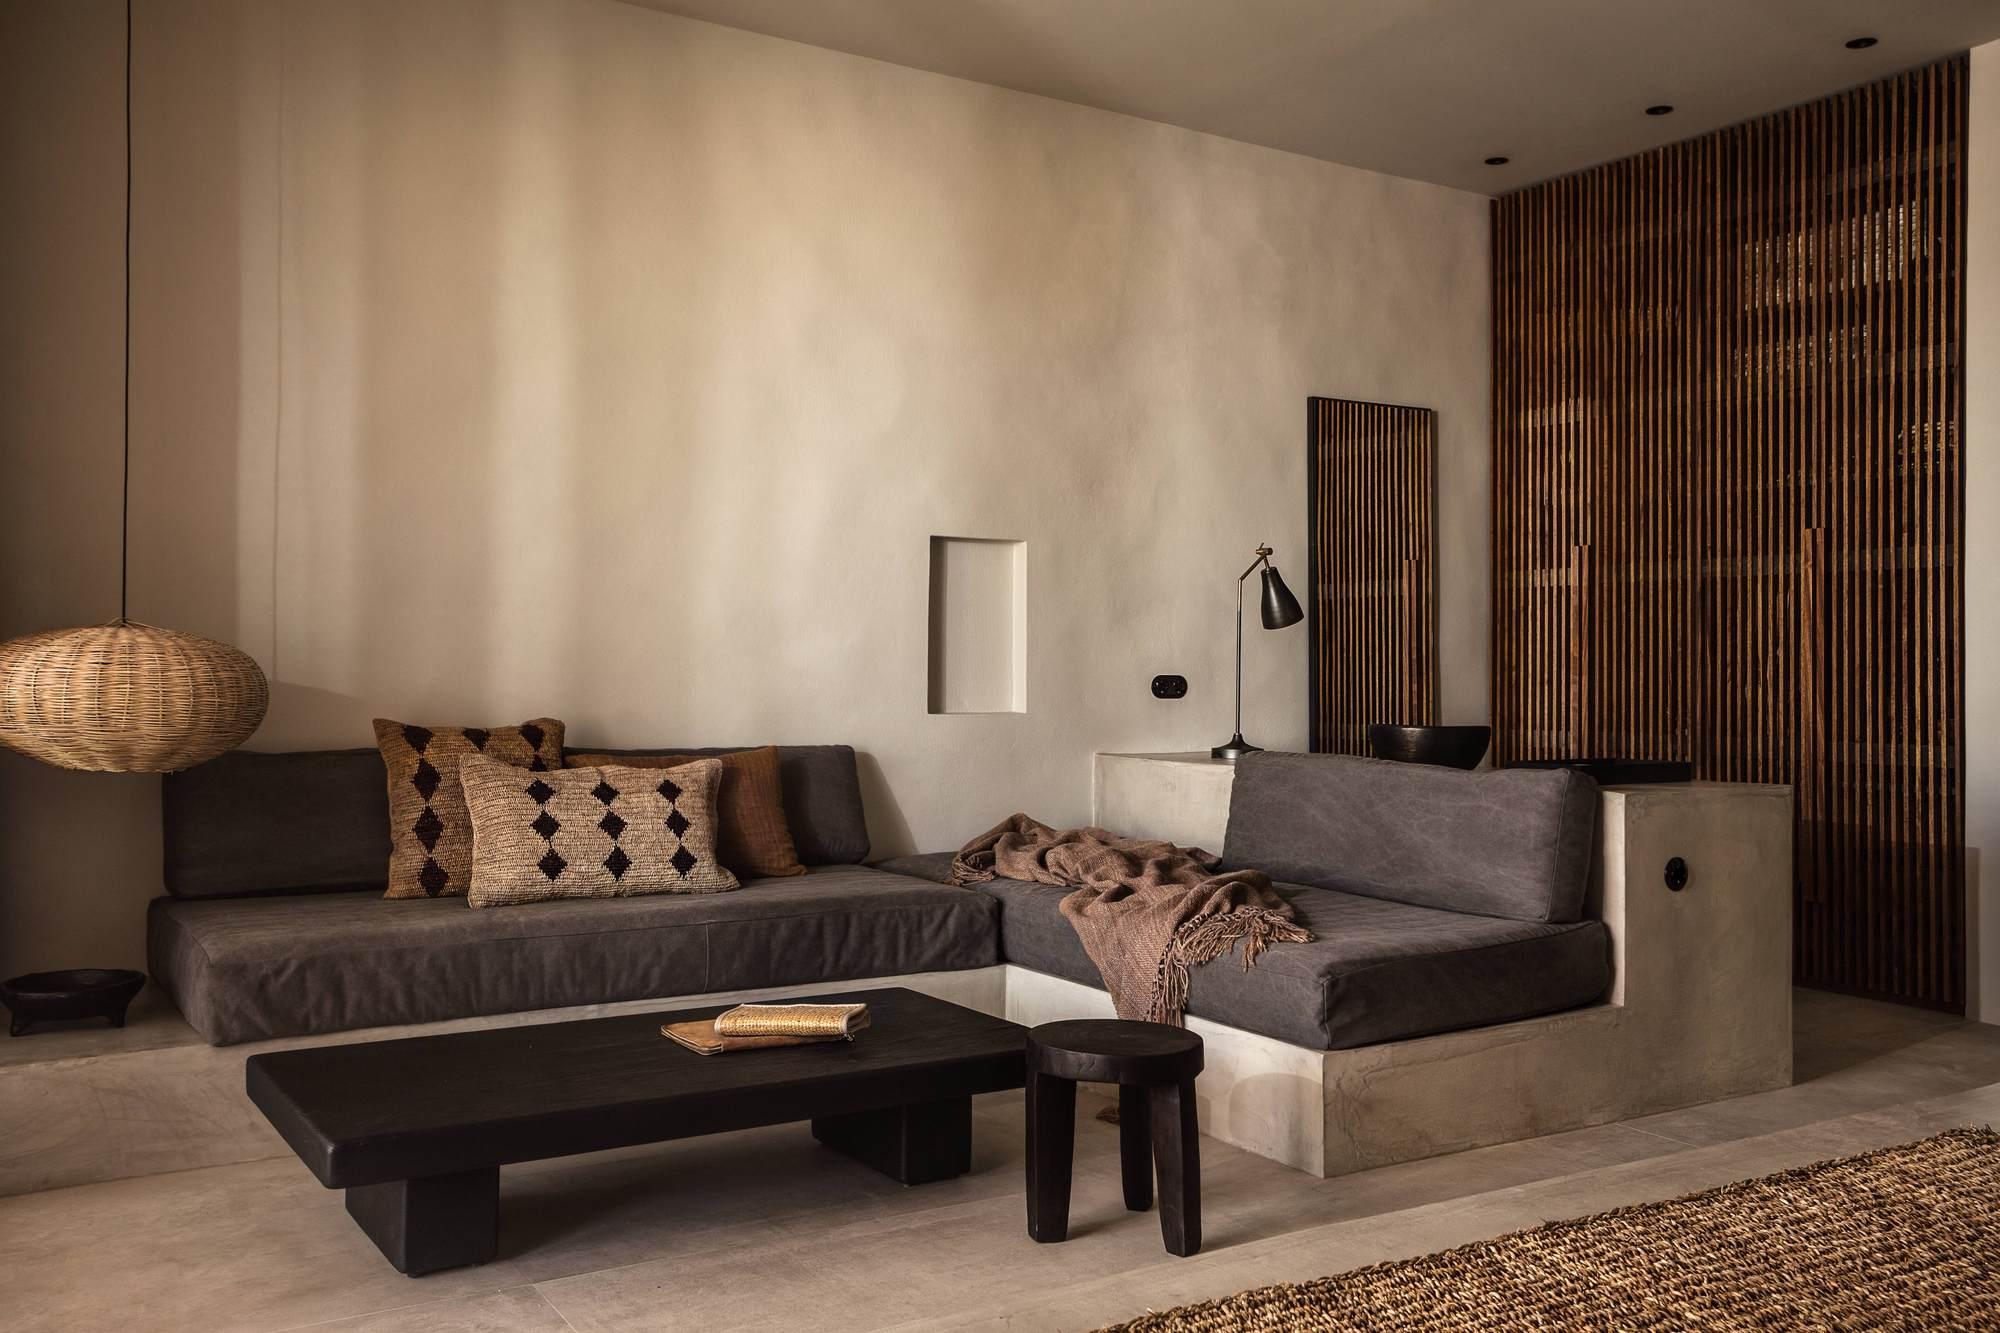 Gallery of casa cook kos hotel mastrominas architecture 10 for Design boutique hotel kos